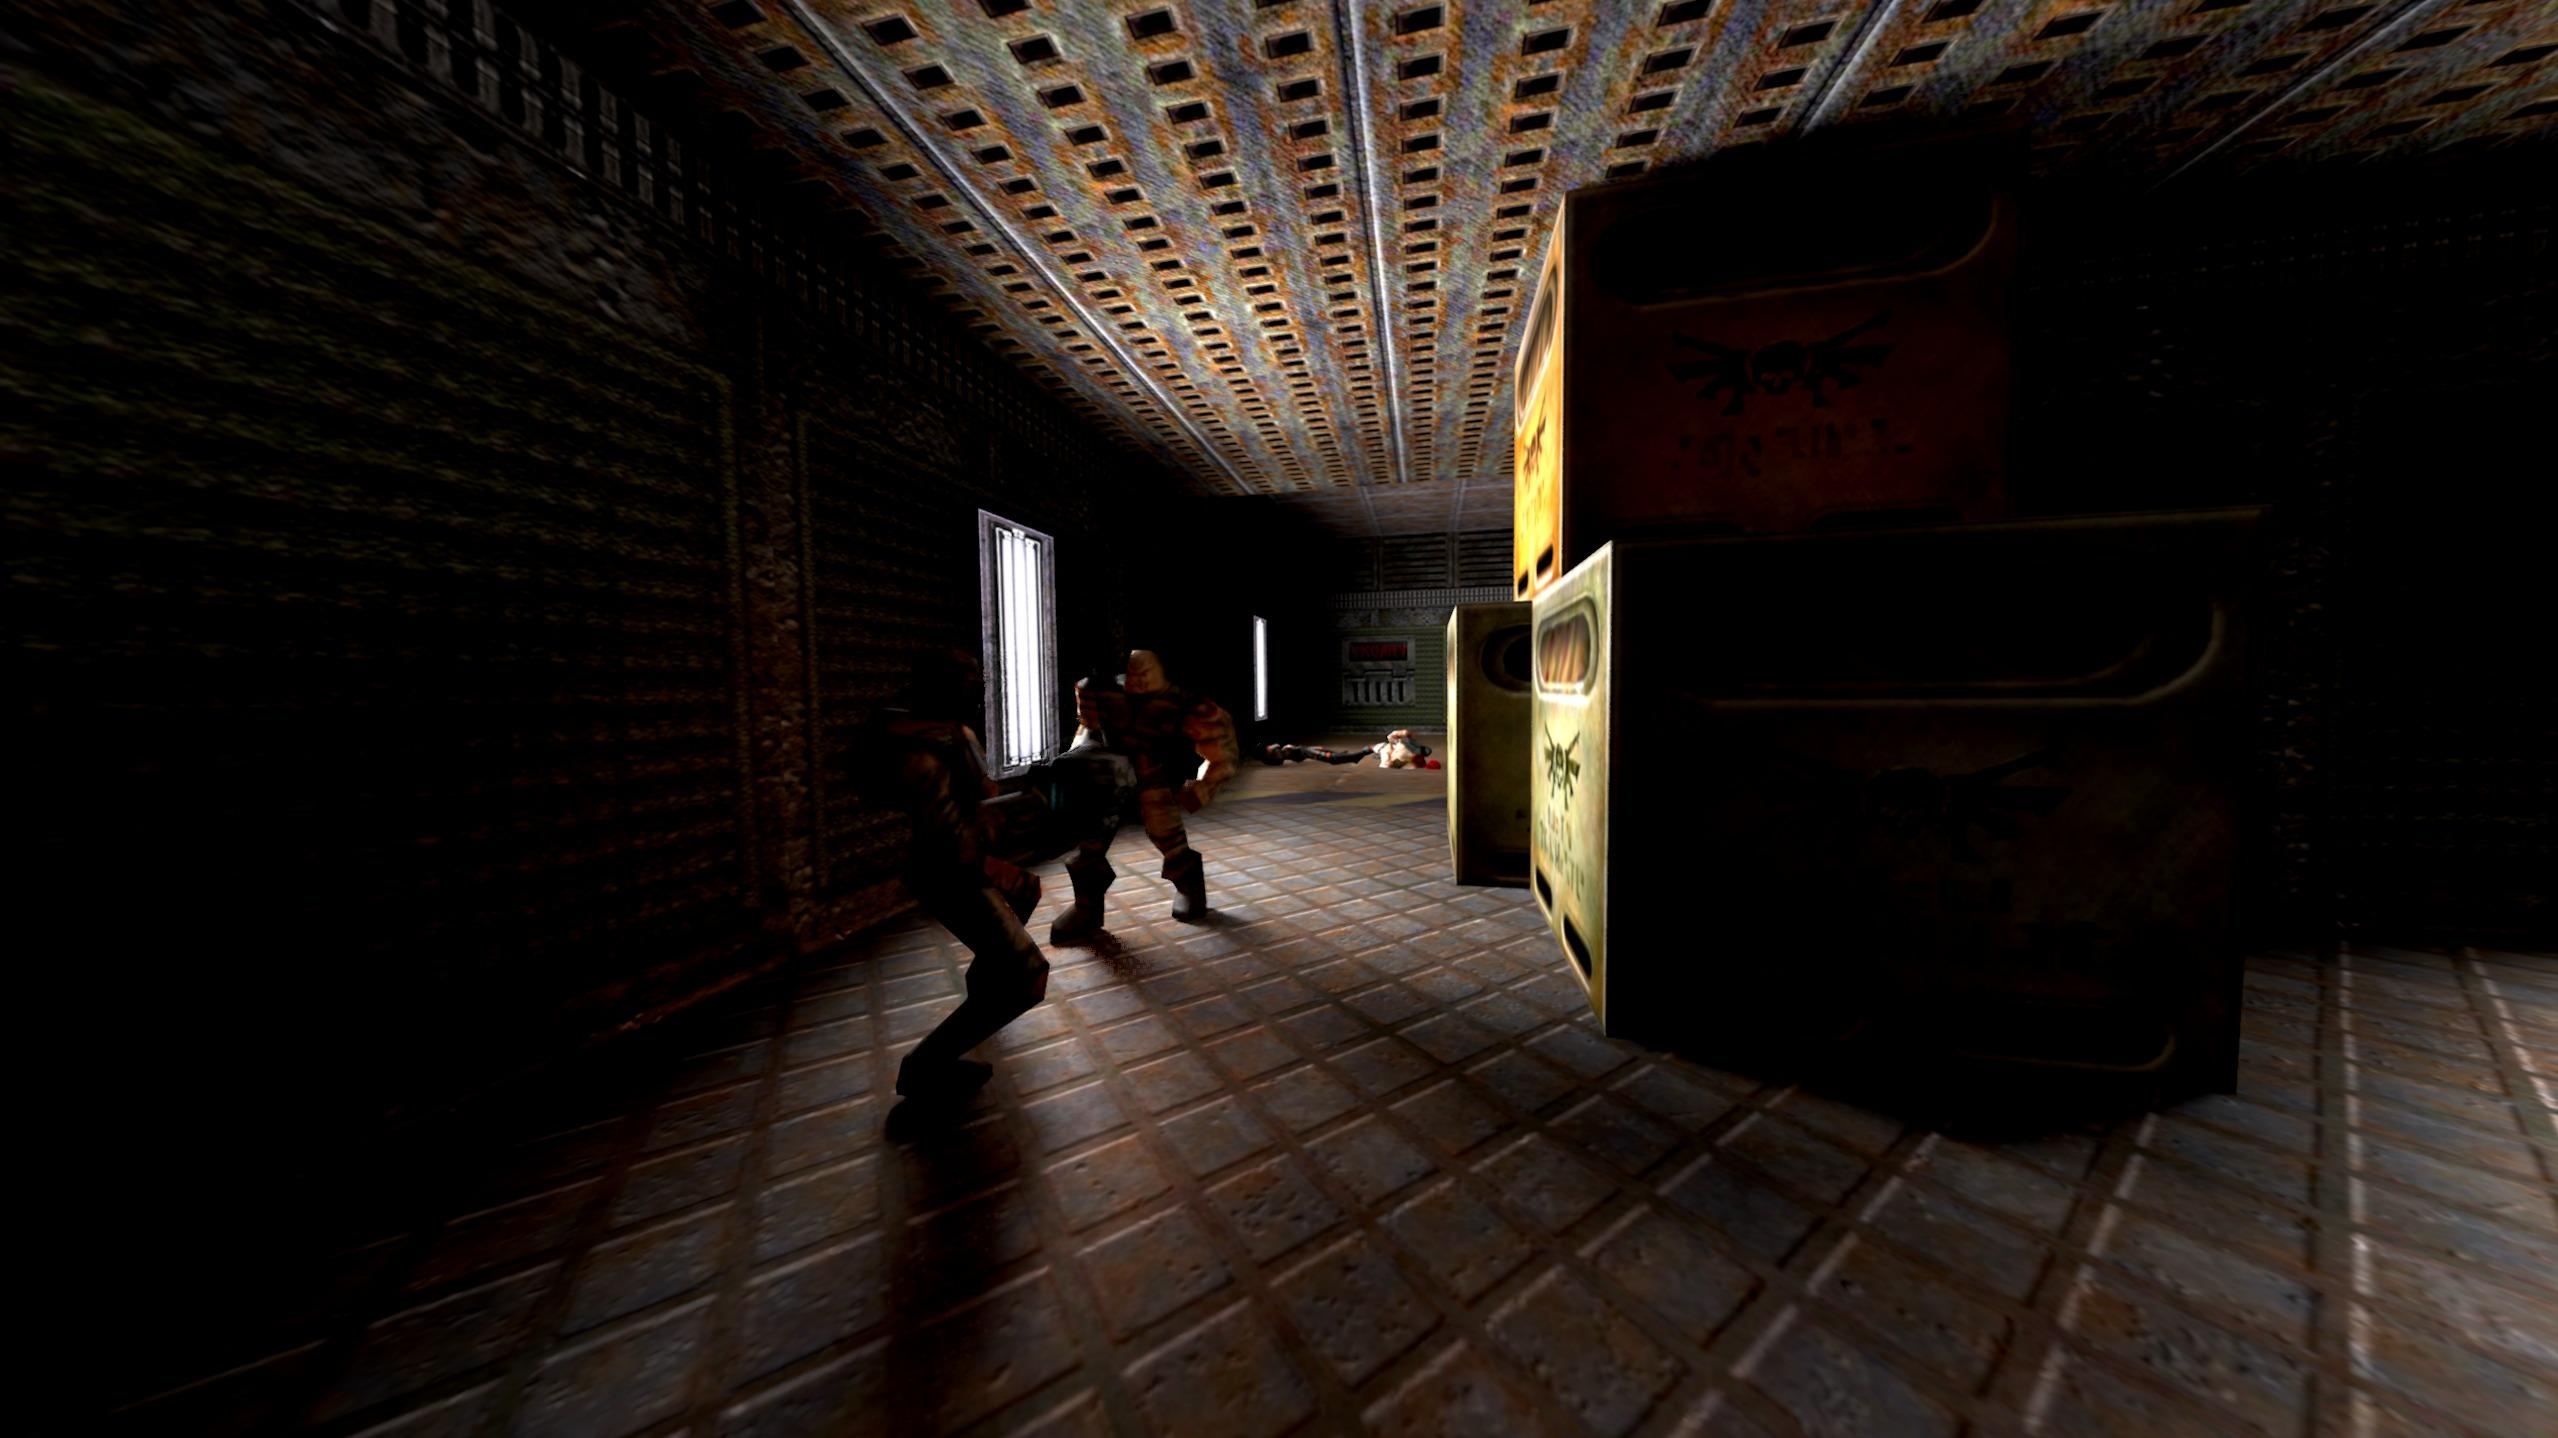 Q2VKPT: Completely rewritten Quake II with realistic lighting